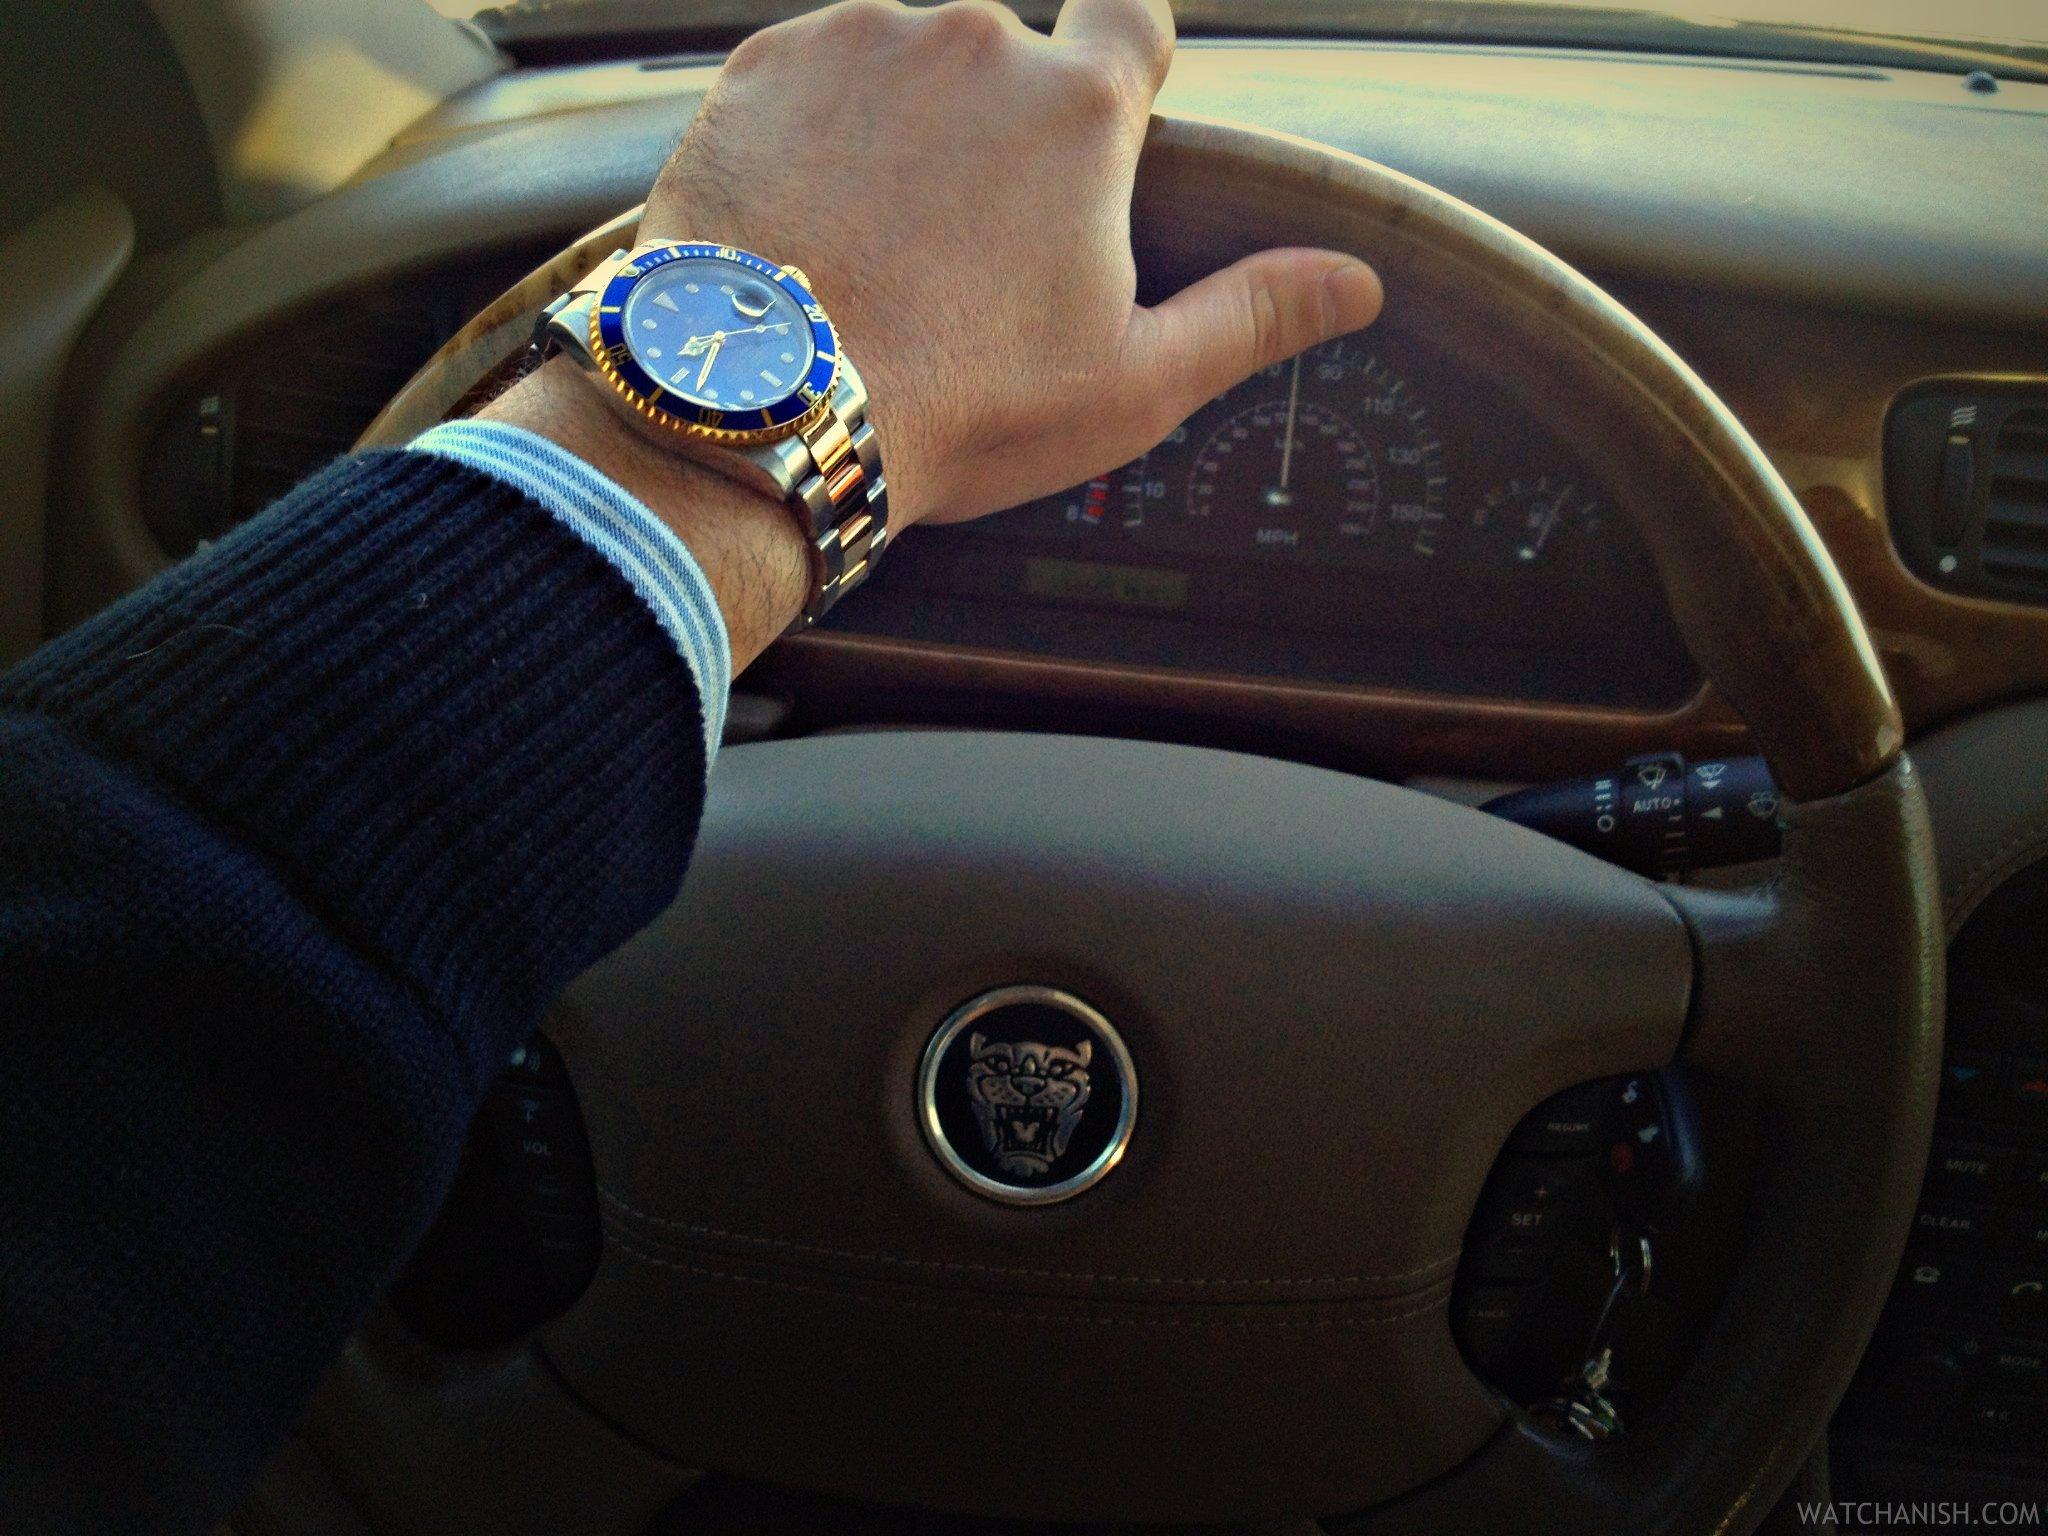 Beautiful Rolex Wallpaper - Rolex-Submariner-16613LB Picture_143393.jpg